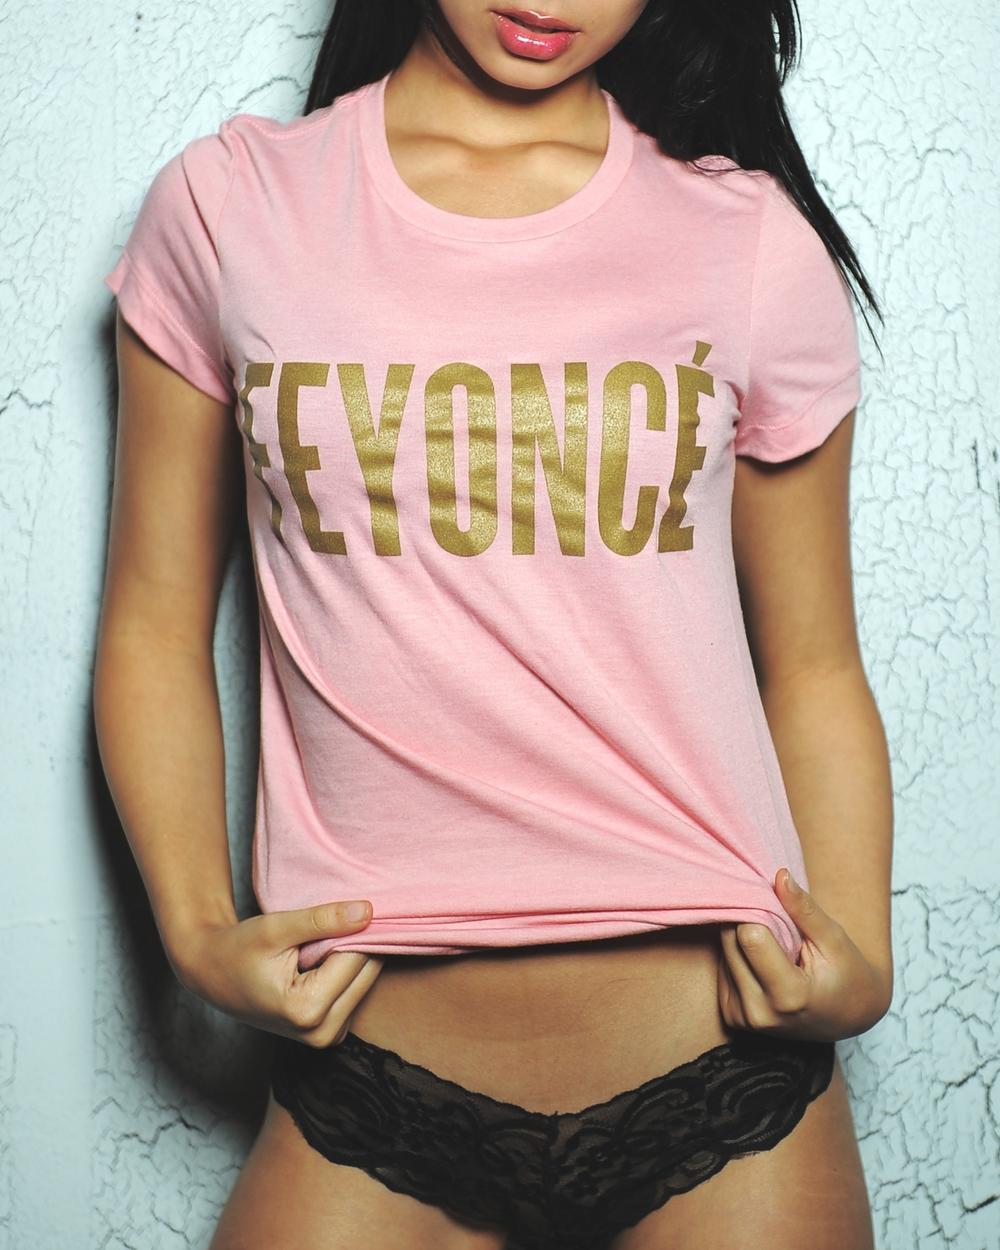 Womens Feyonce T Shirt Beyonce Pink — Emdem Apparel Handmade T ...